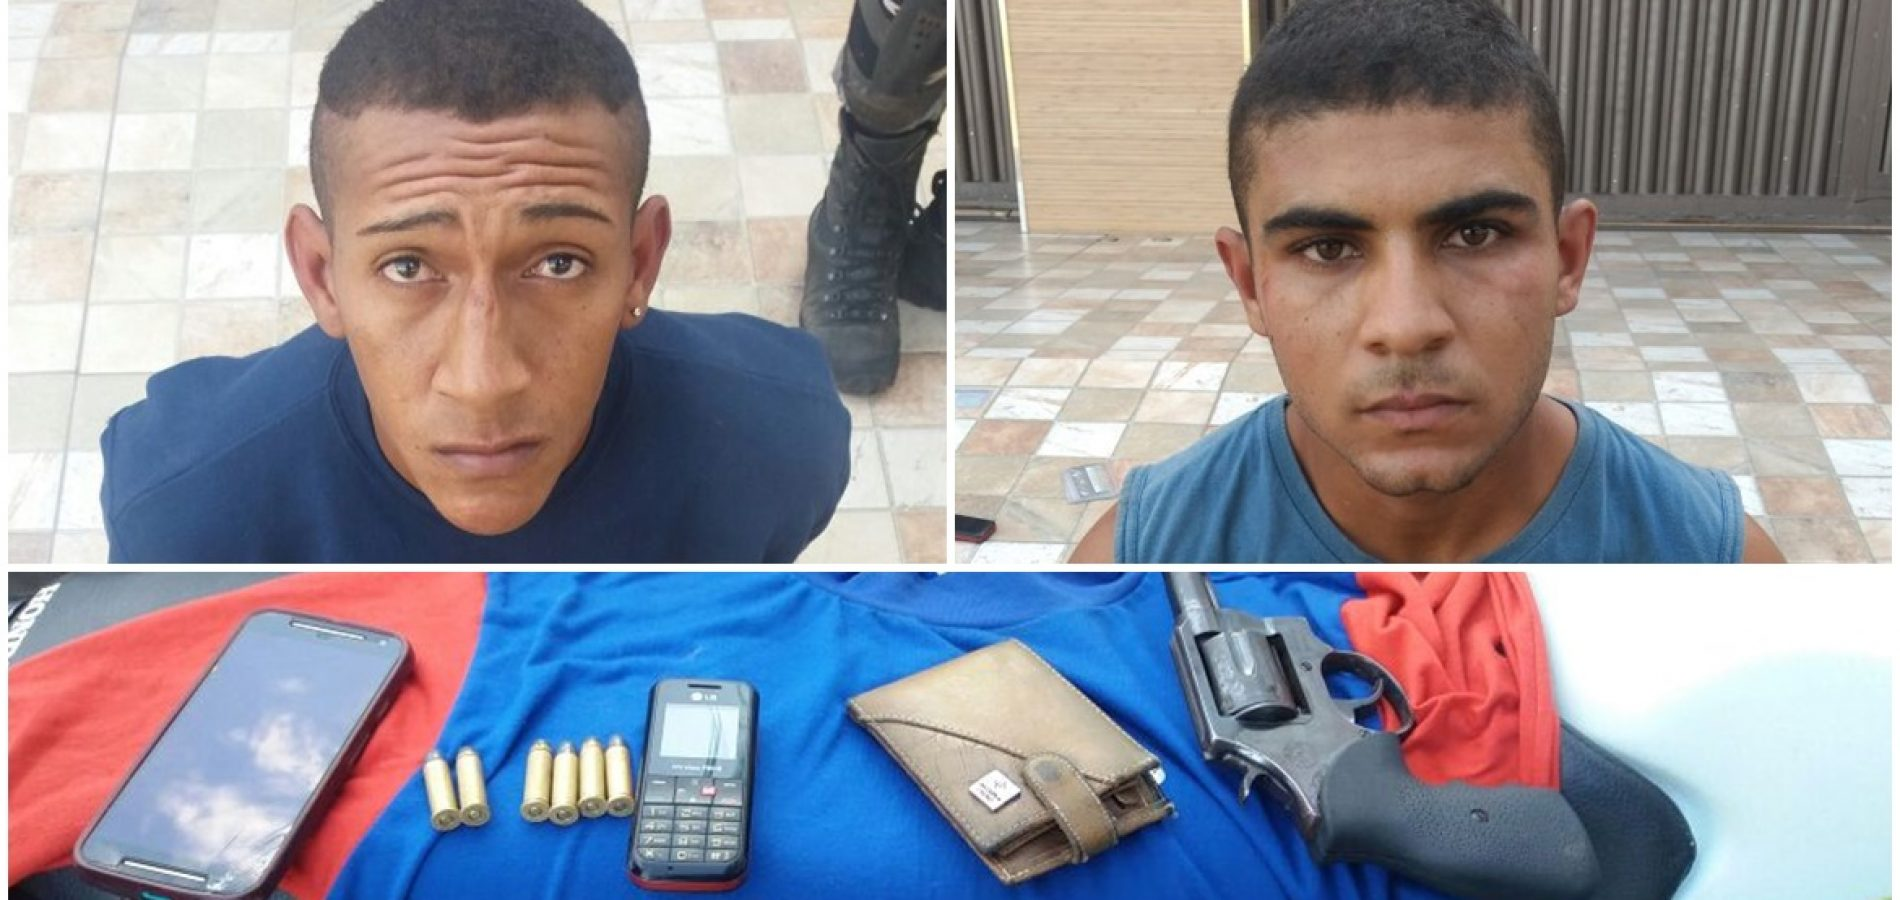 PICOS | Polícia prende dupla armada suspeita de assalto próximo a colégio particular